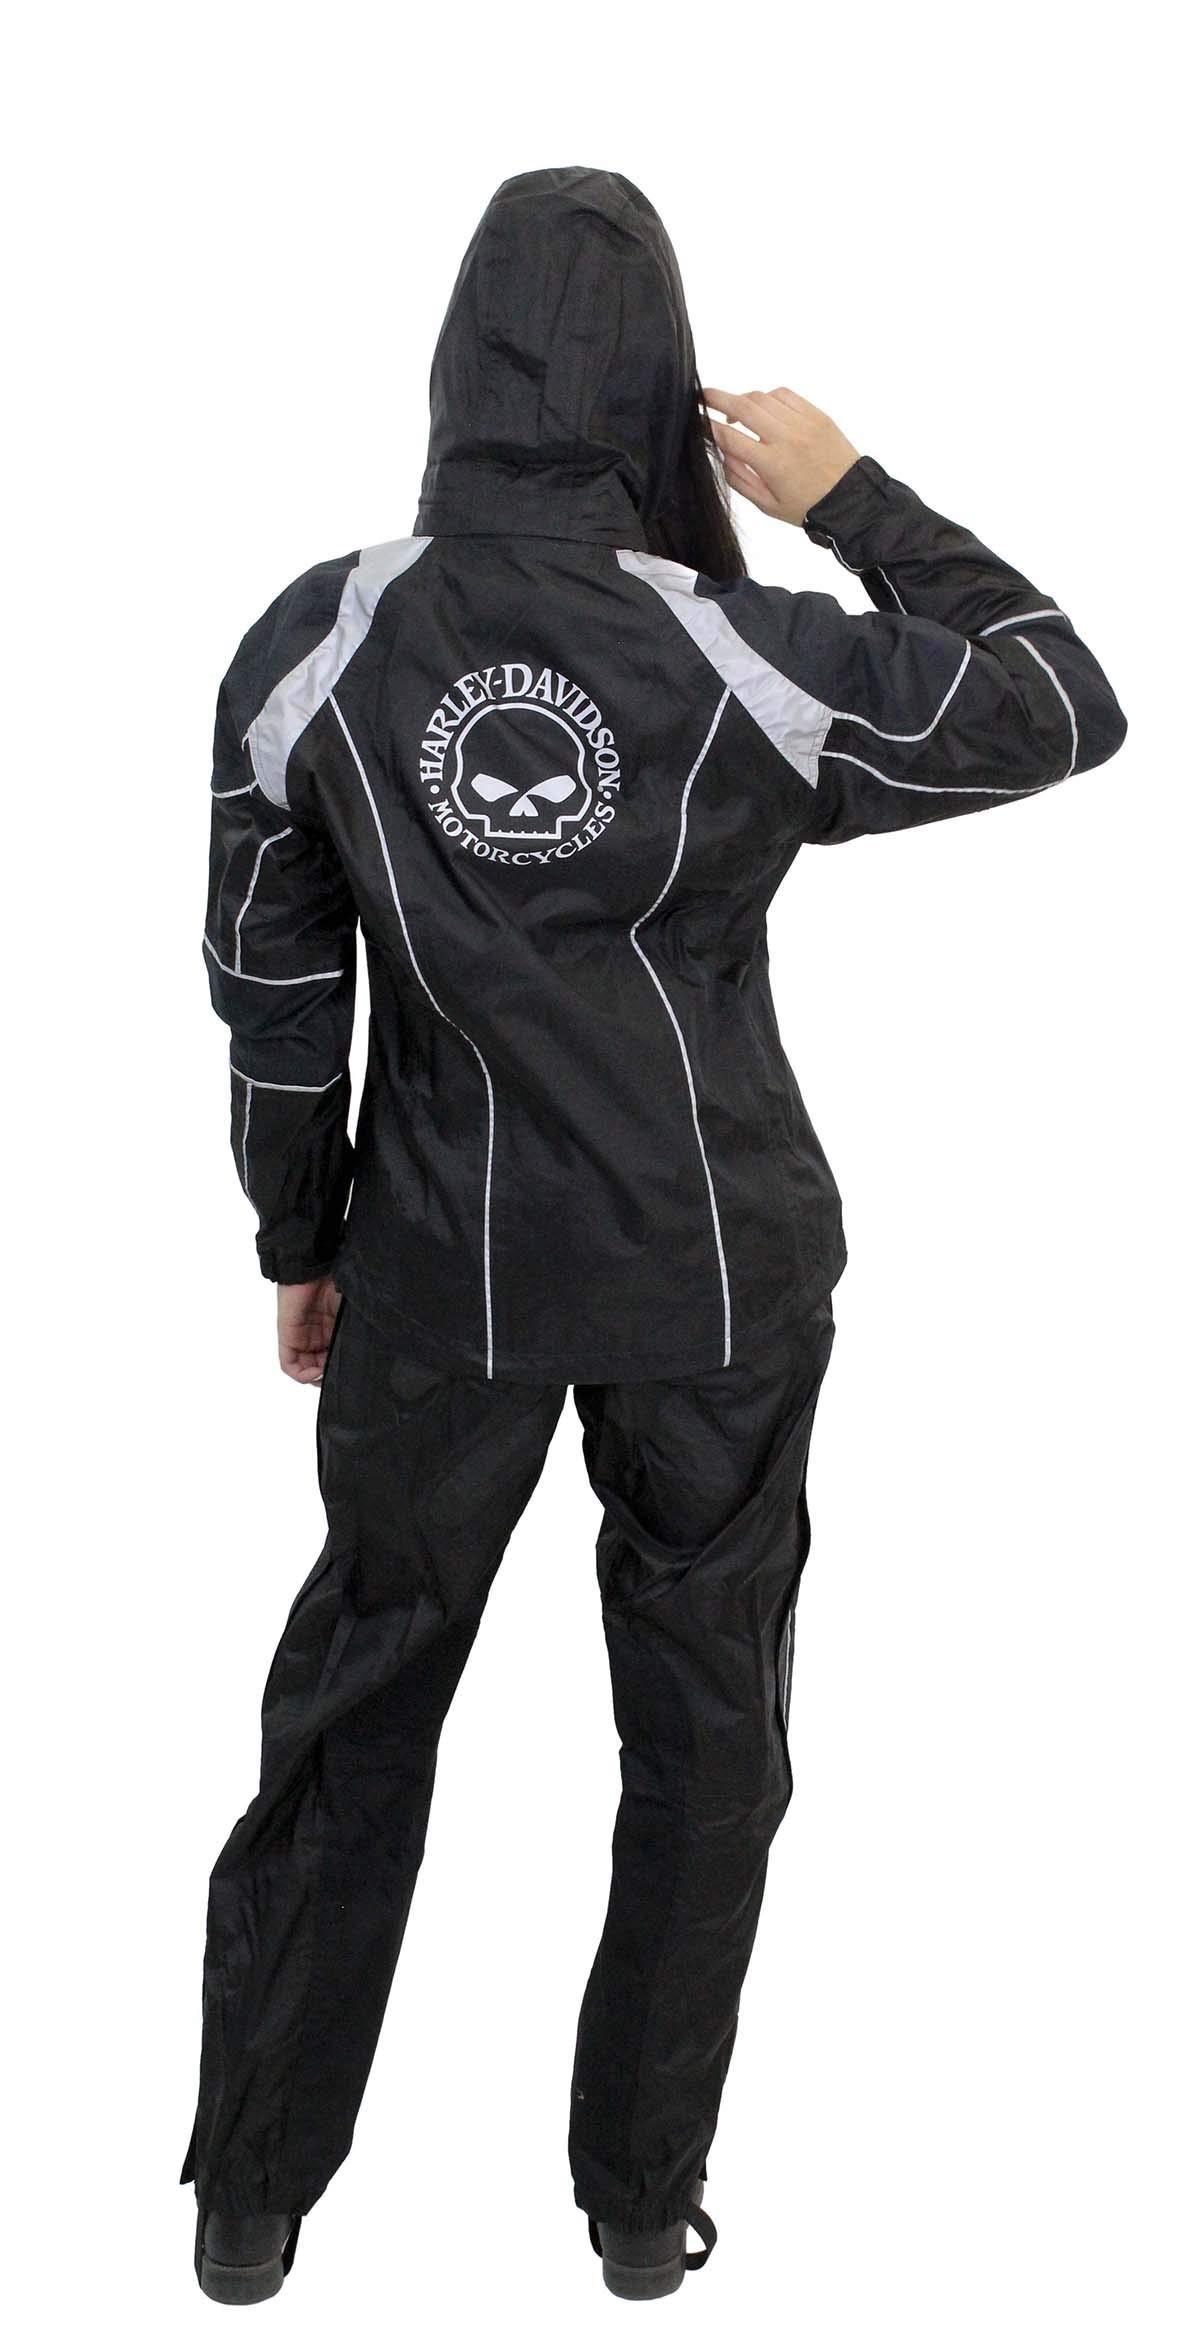 Harley-Davidson Womens Willie G Skull Reflective Waterproof Black Rain Suit 98363-15VW (2X)